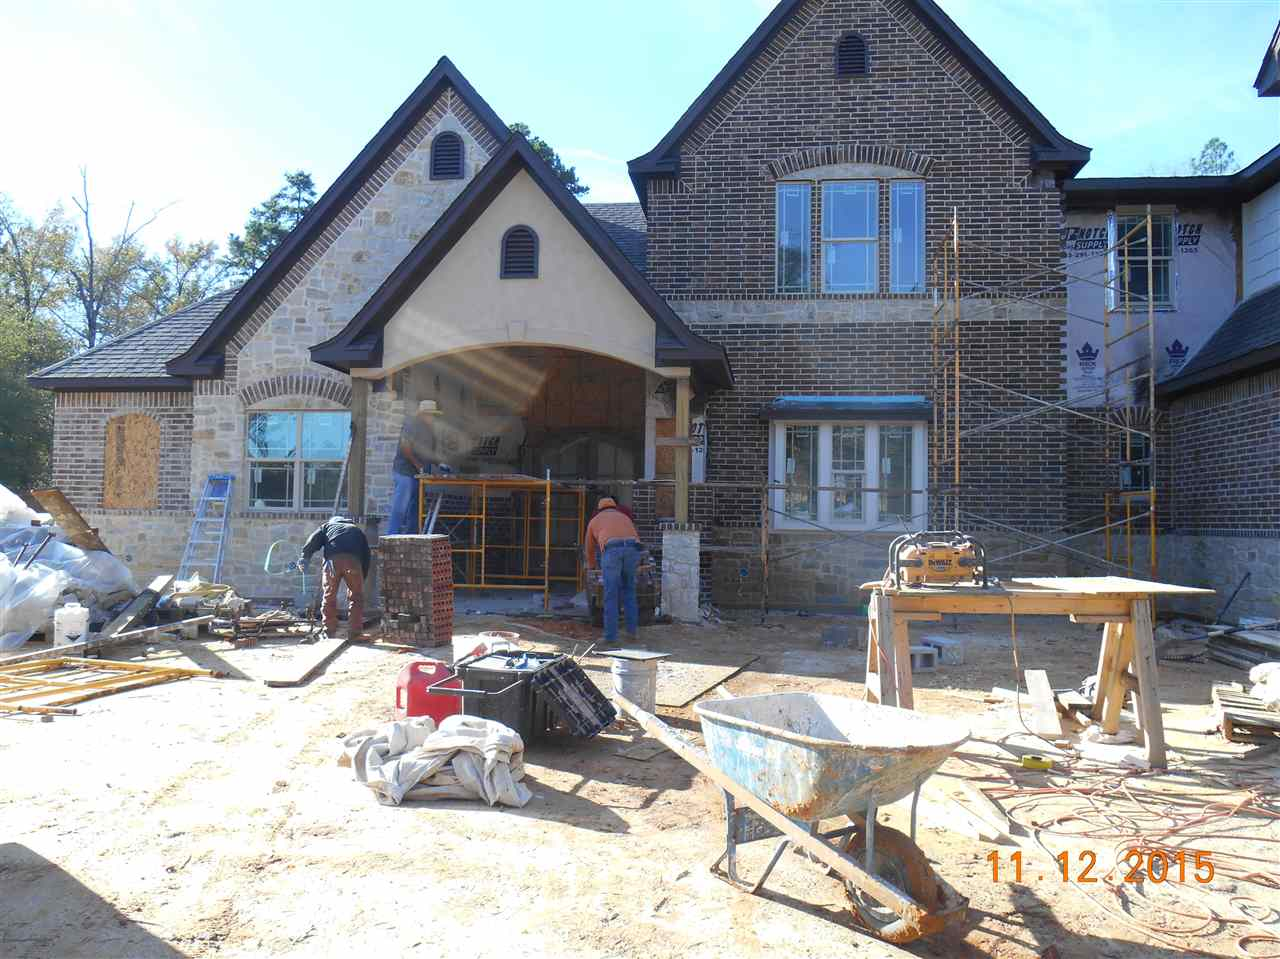 Property for sale at TBD S E Mountain Rd, Longview,  TX 75604